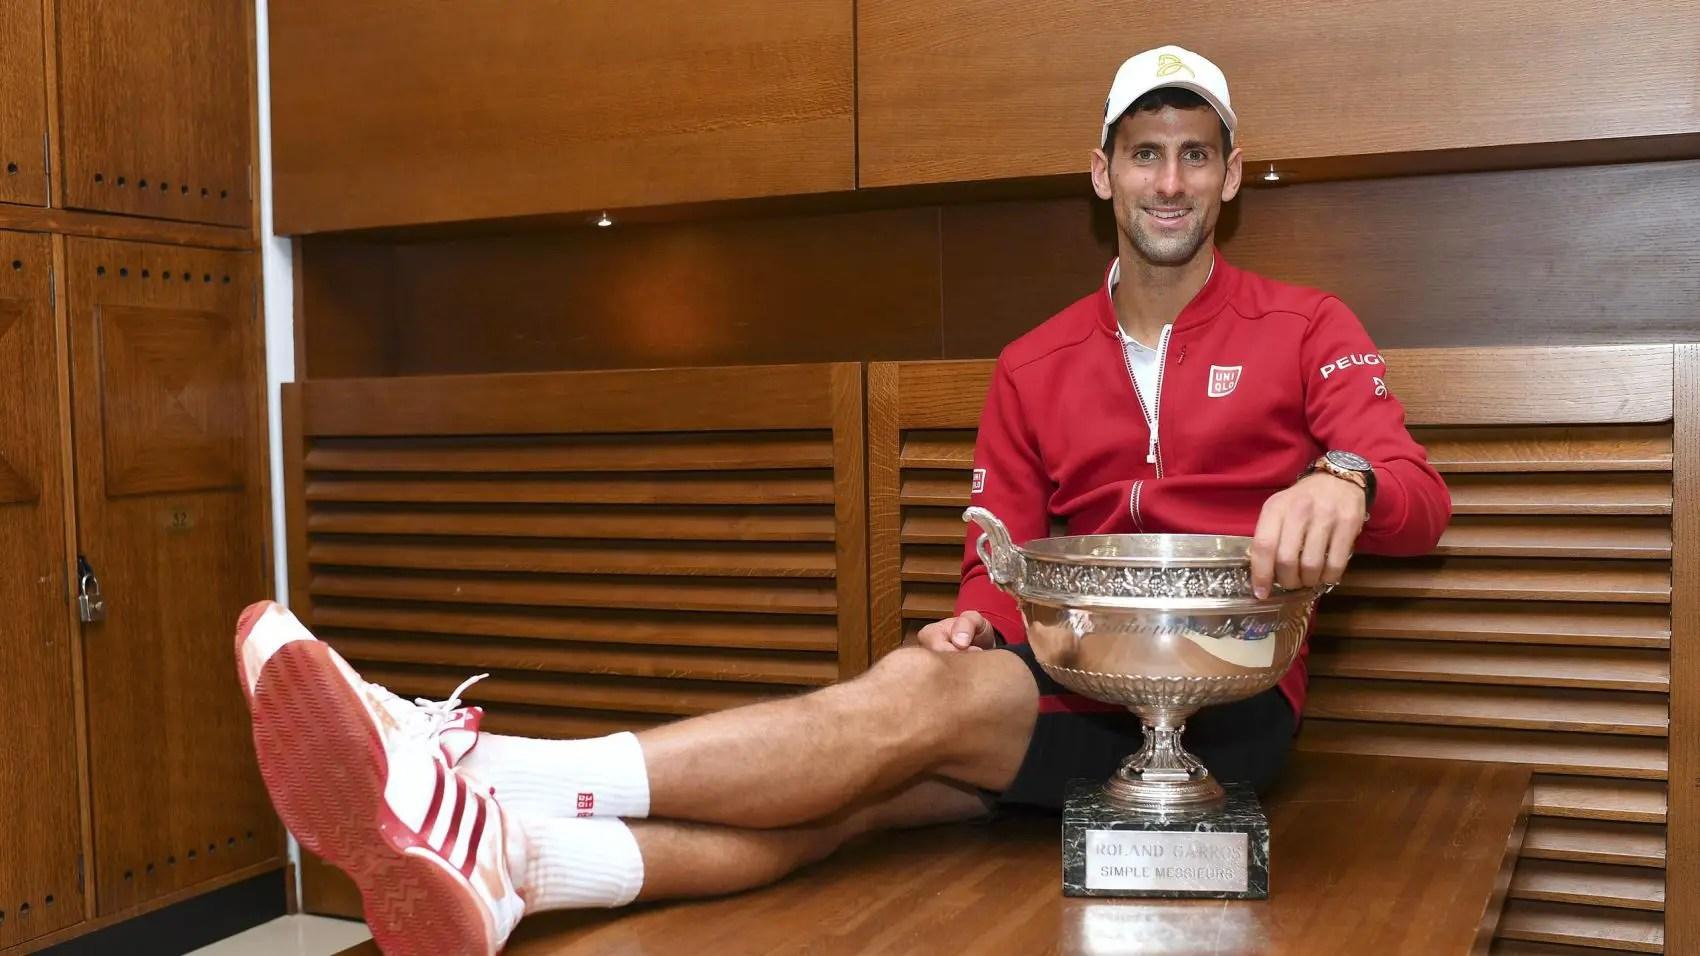 Djokovic Beats Murray To Win First French Open, 12th Slam